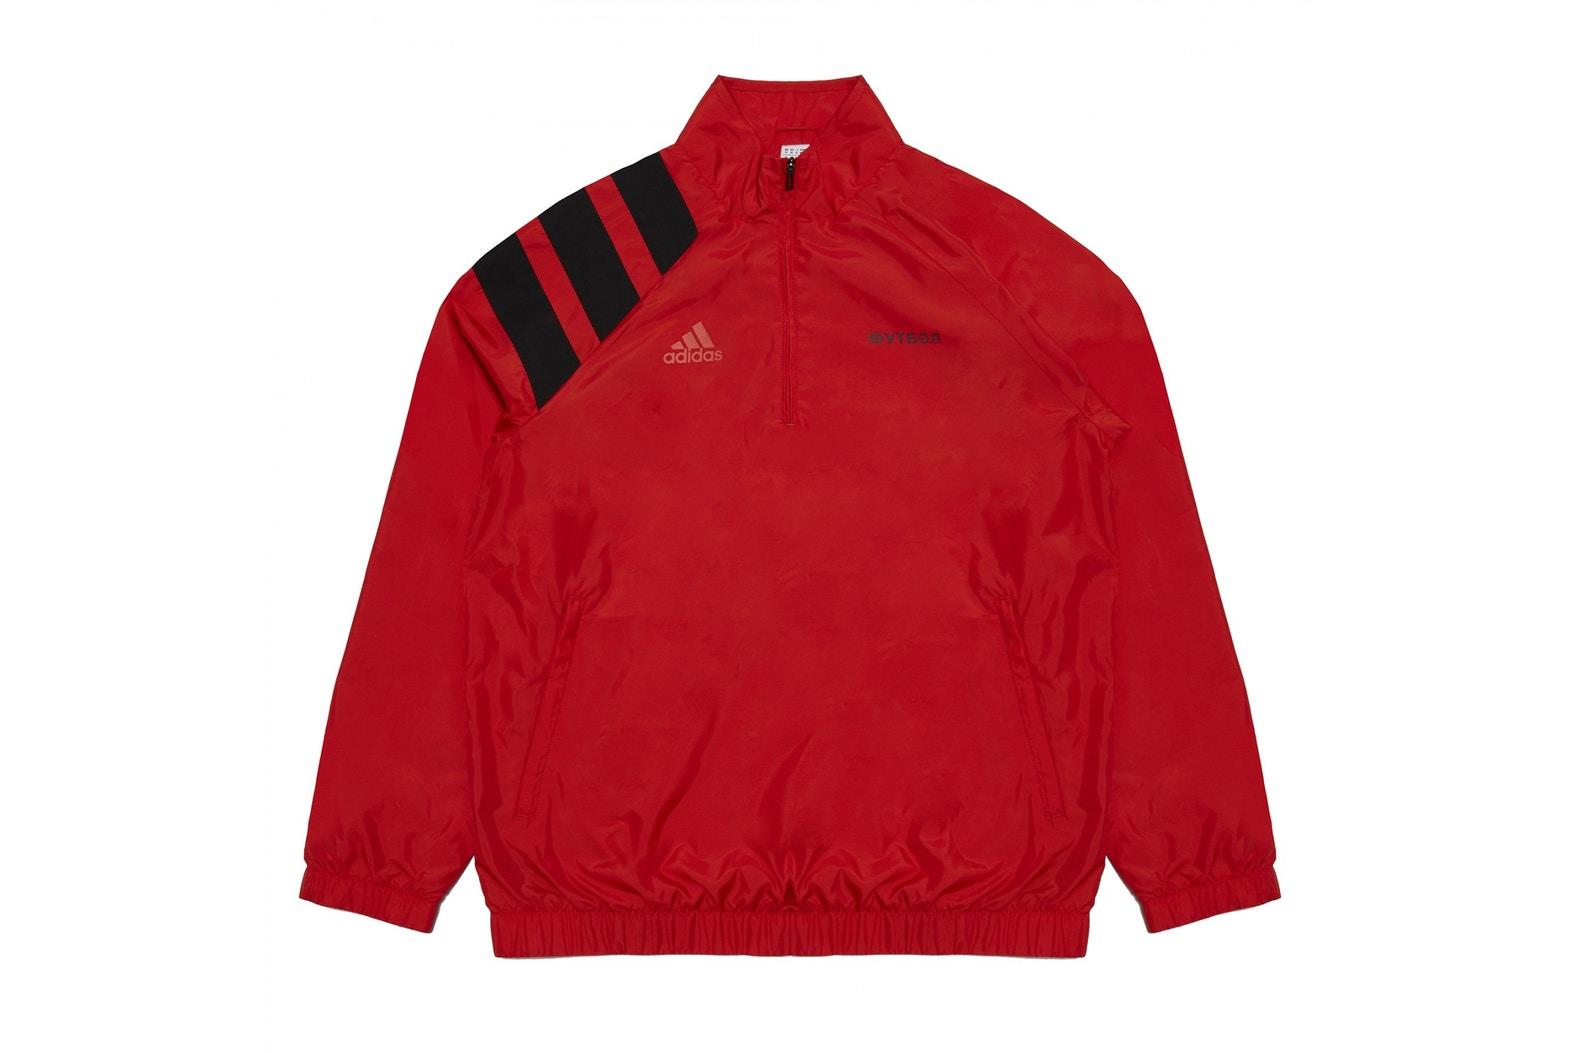 gosha-rubchinskiy-x-adidas-still-available-dms-ginza-2